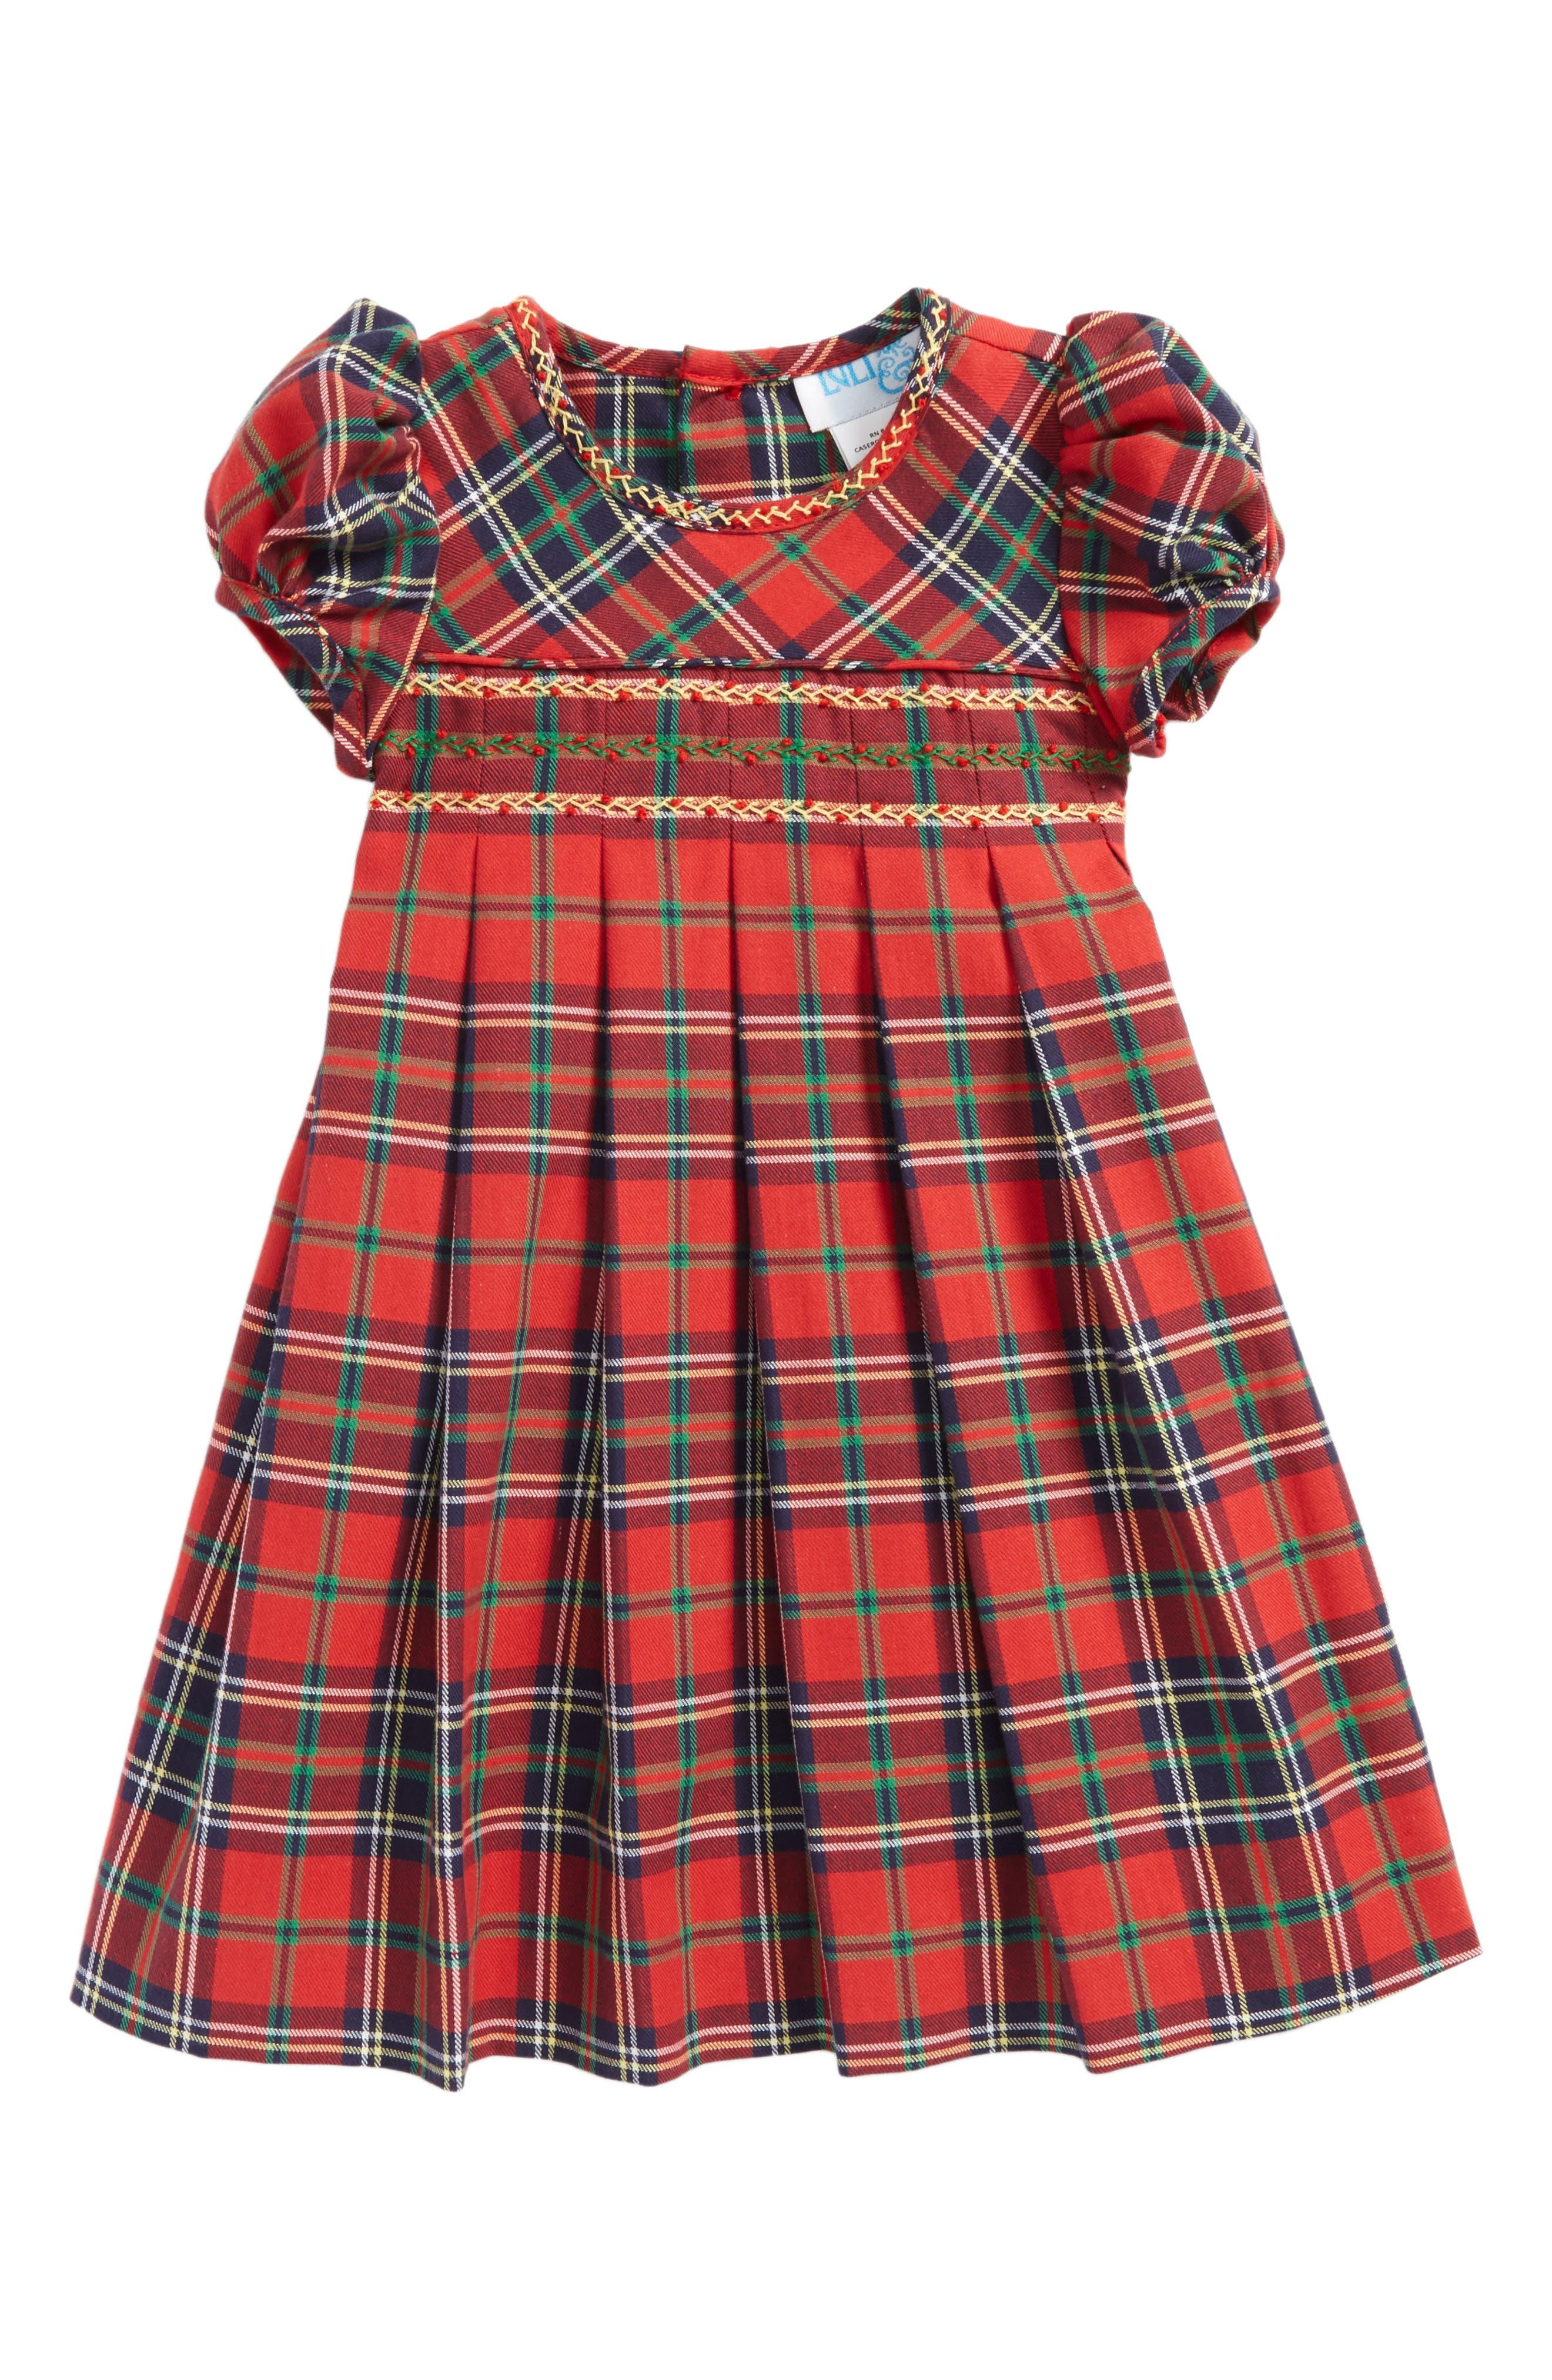 Alternate Image 1 Selected - Luli & Me Plaid Pleated Dress (Baby Girls)